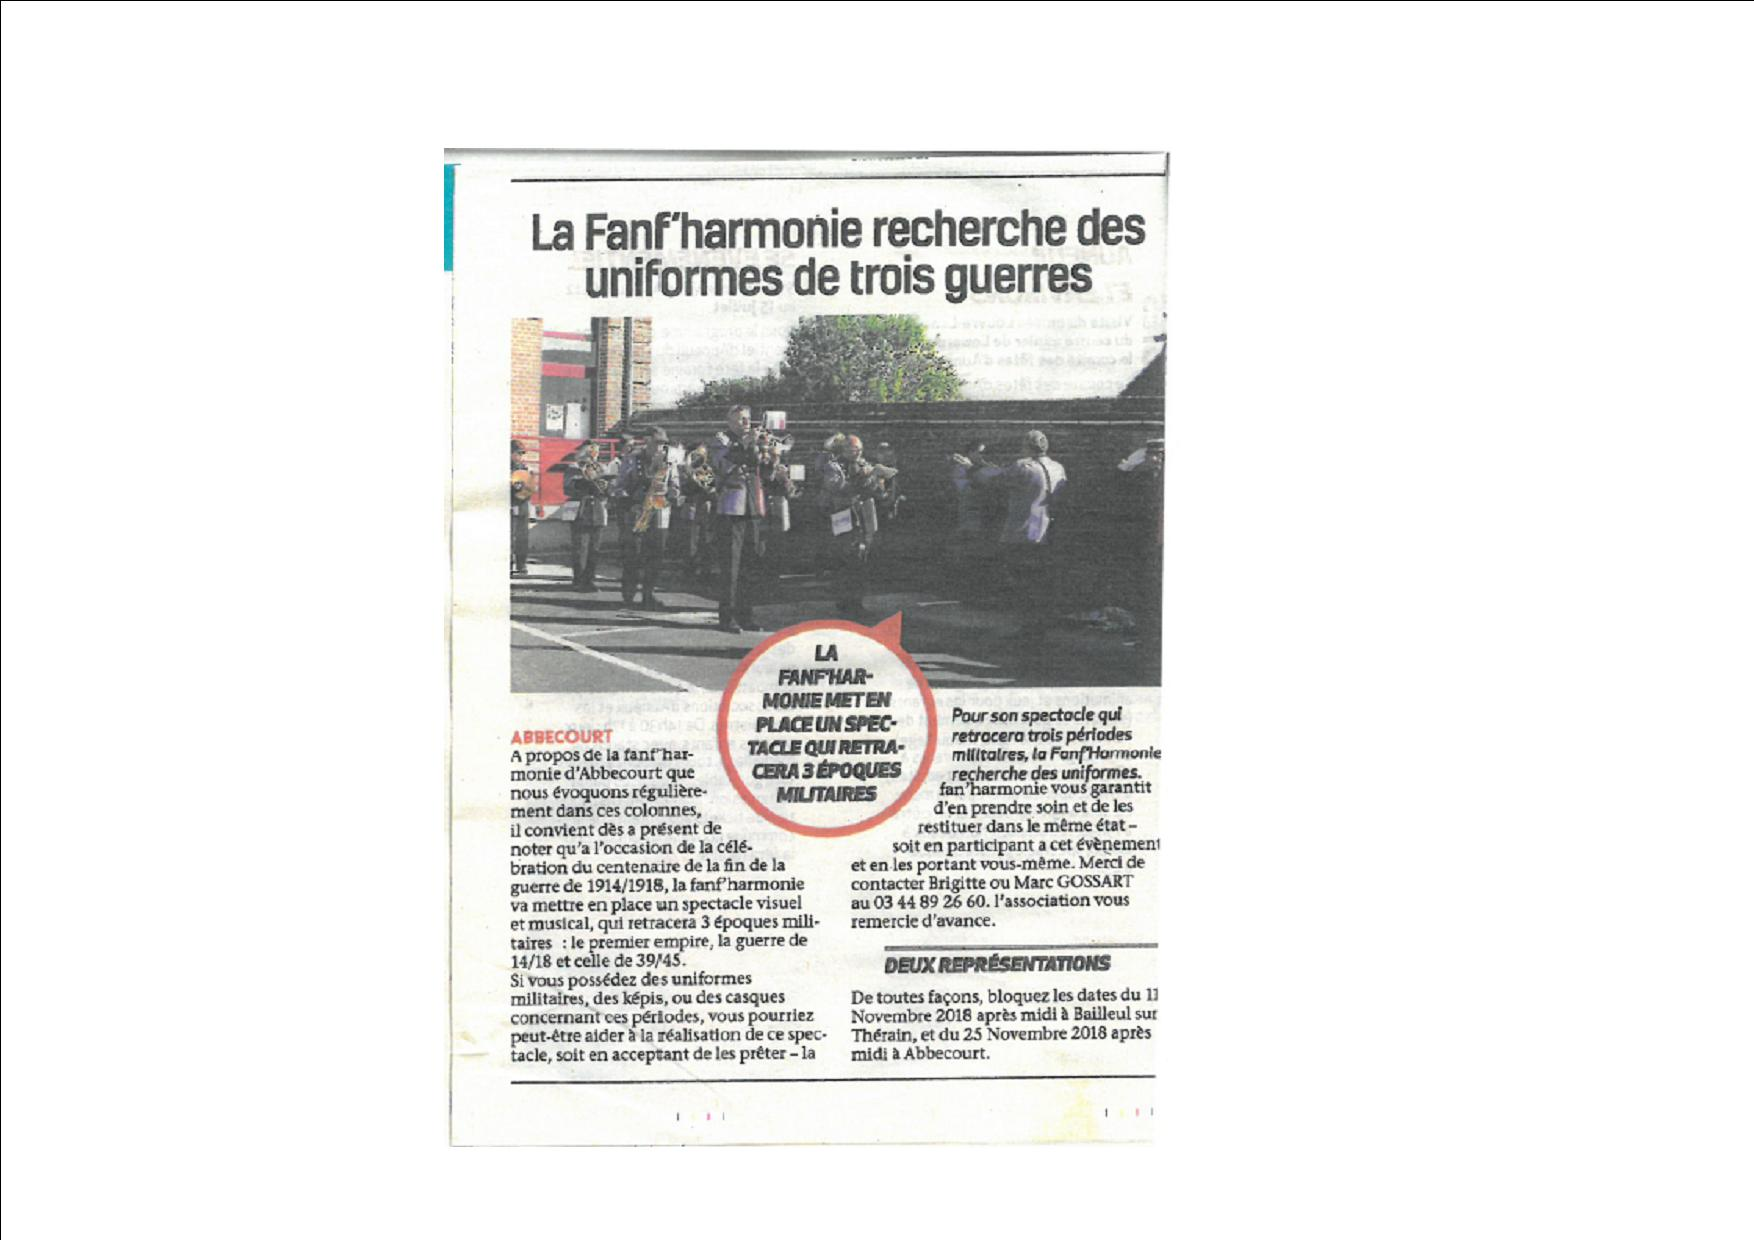 fanfharmonie 4.jpg